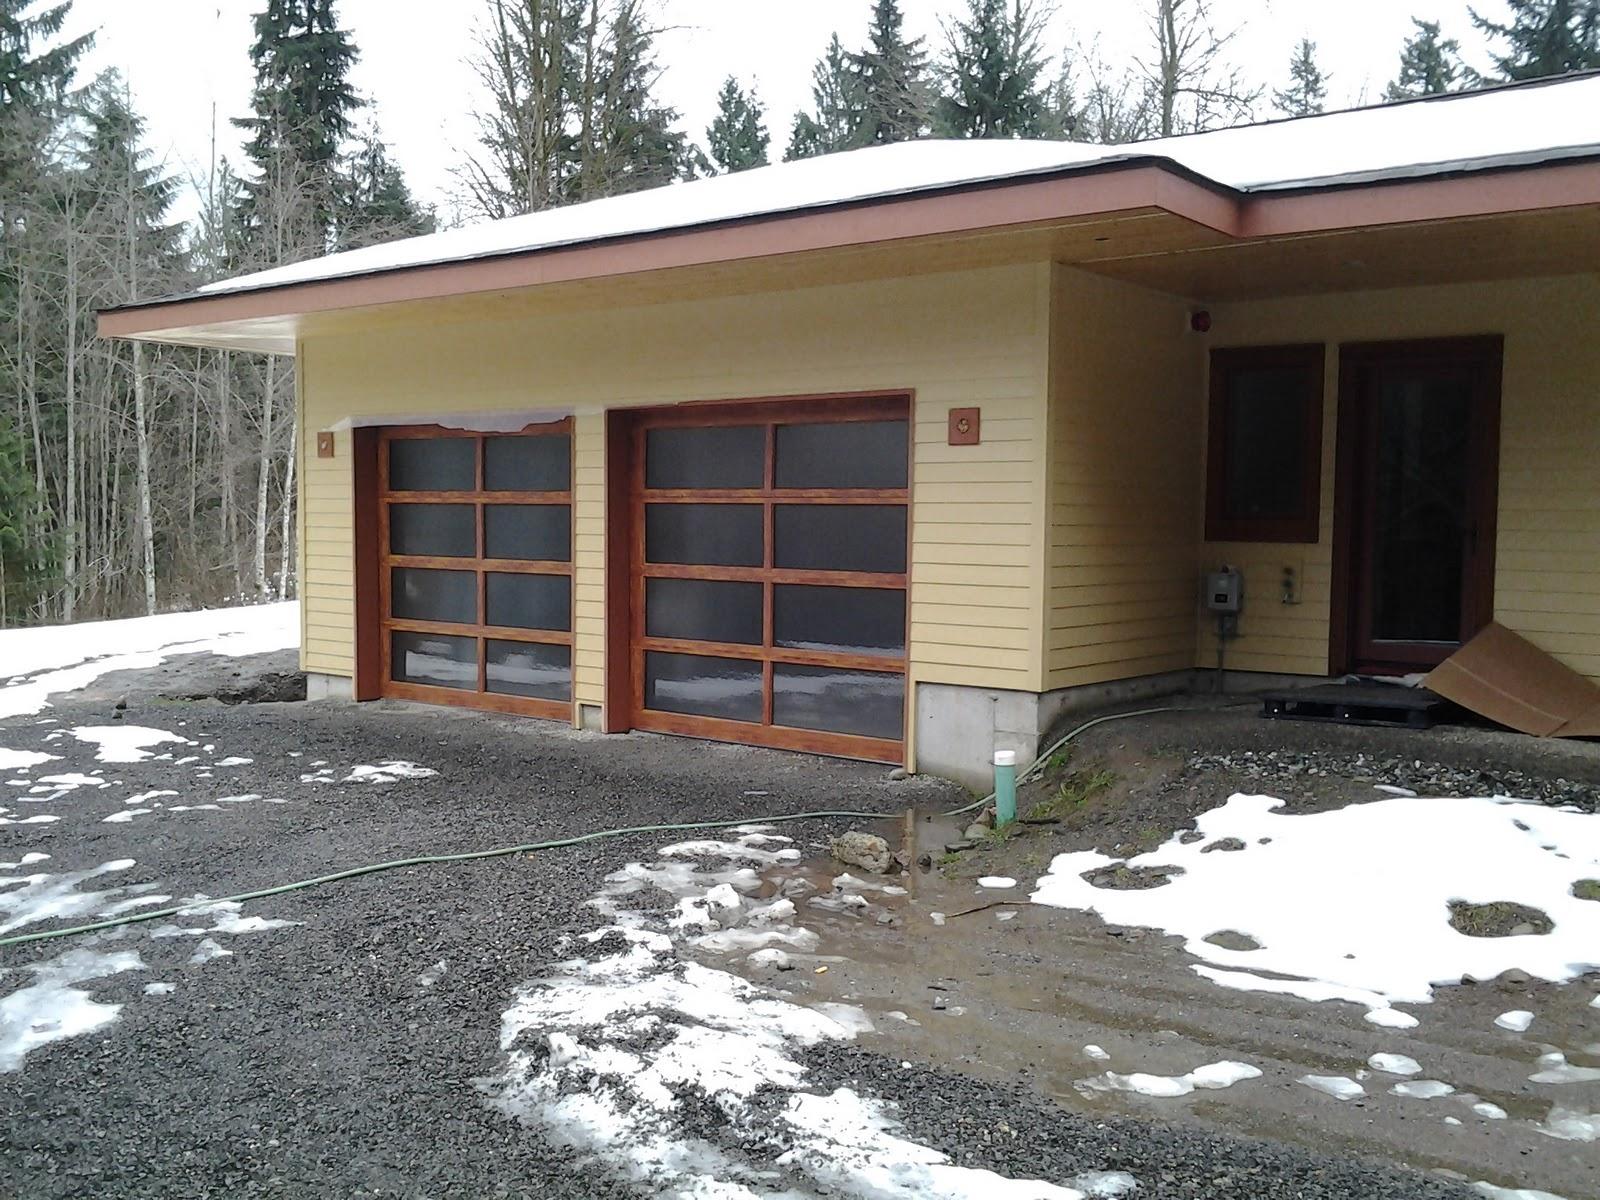 1200 #634735 The Precision Garage Door Guy: The Beauty Of Wood In A Aluminum Door save image Precision Entry Doors 45771600